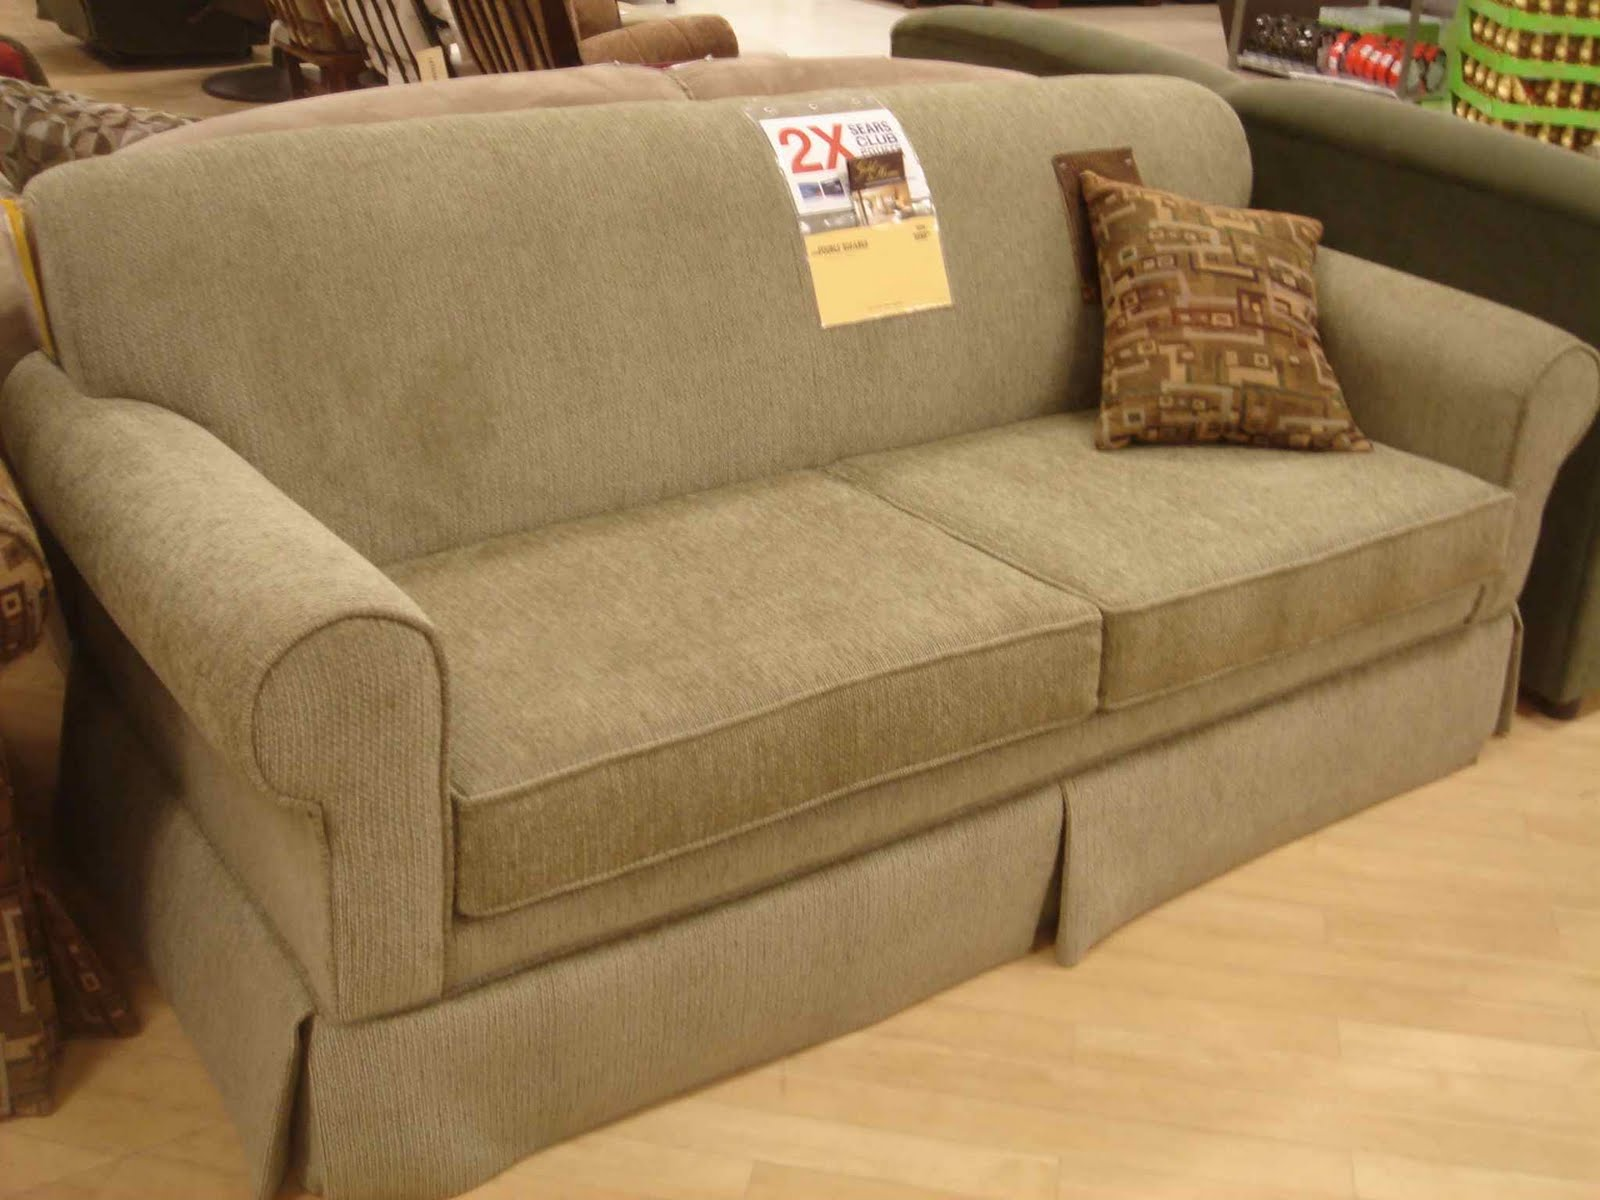 Sofa beds sears smileydotus for Sectional sleeper sofa sears